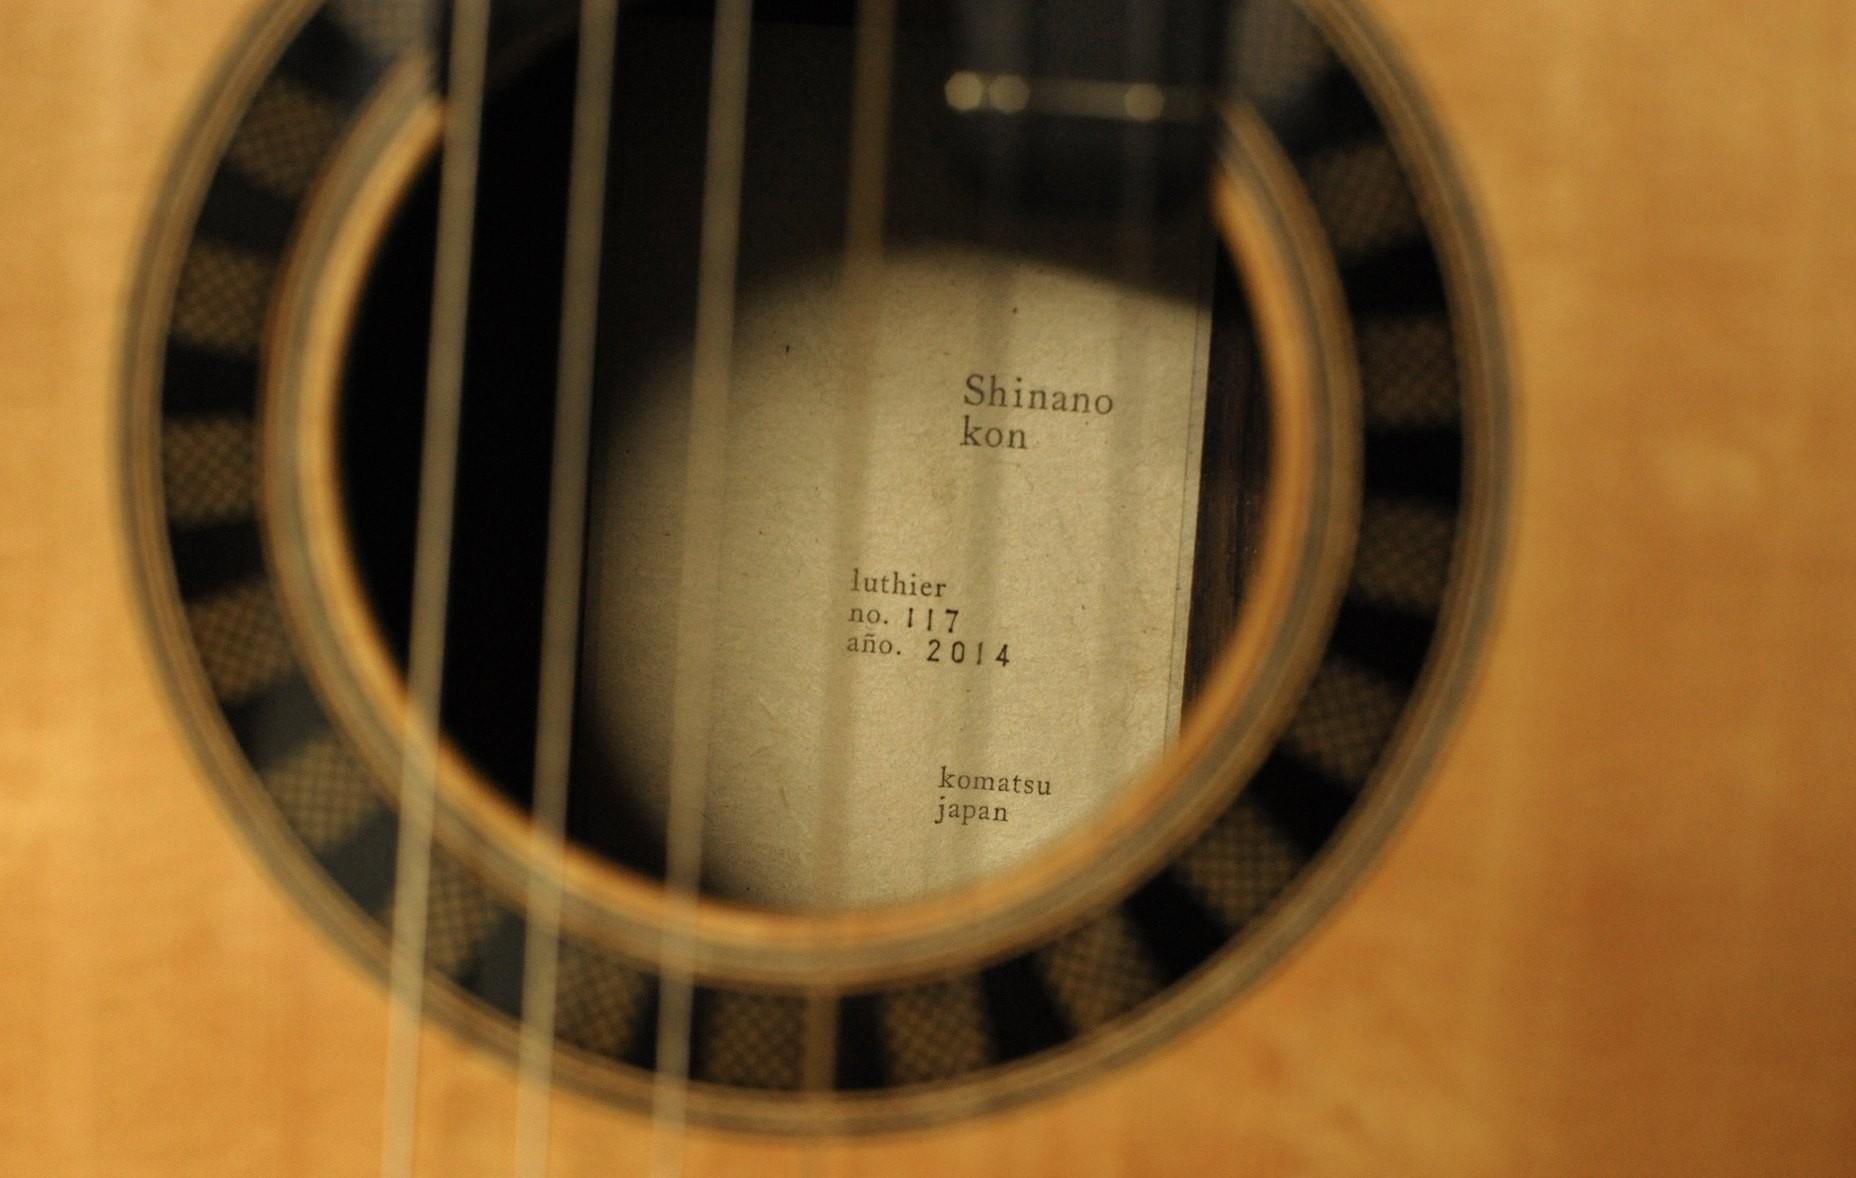 ギター製作工房 近撥弦楽器